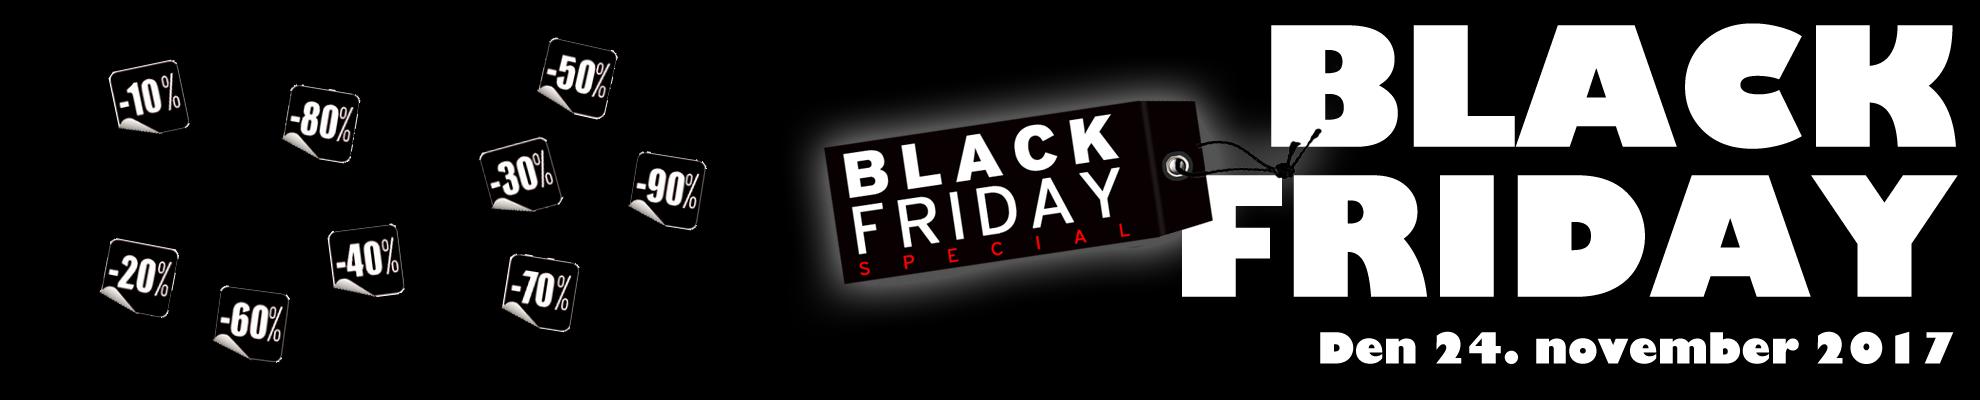 Black Friday 2107